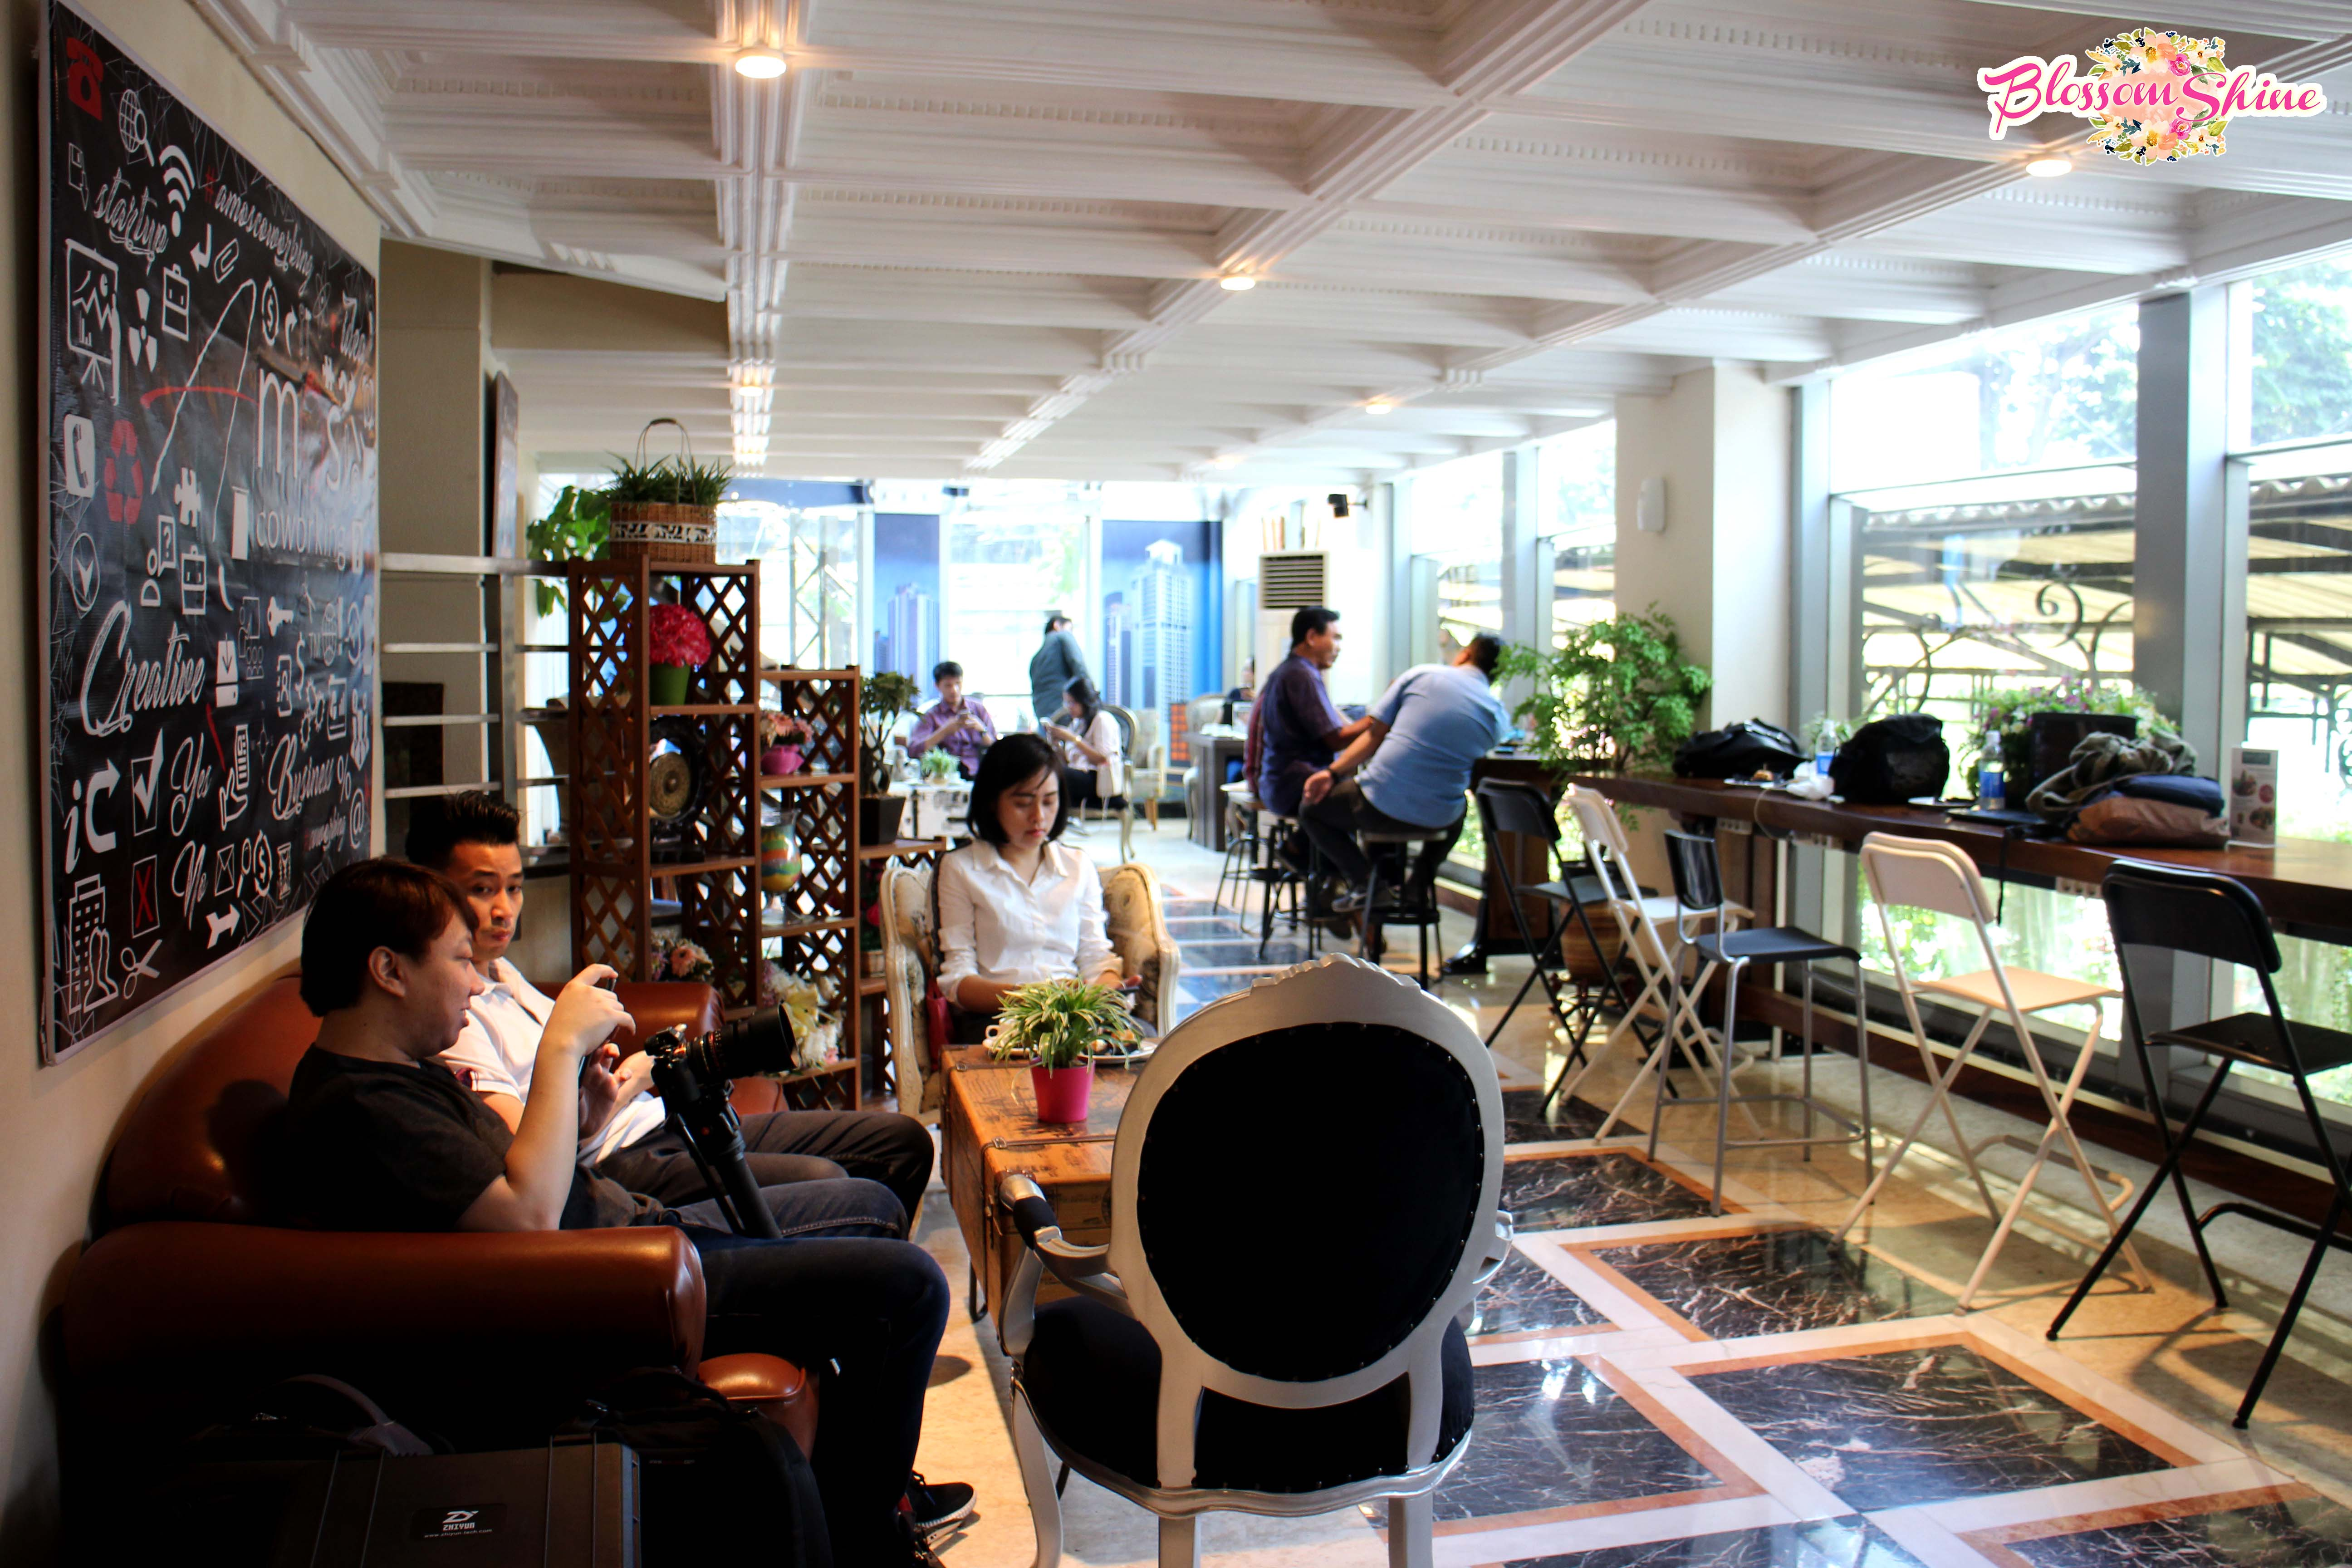 New Coworking Space Di Jakarta Selatan